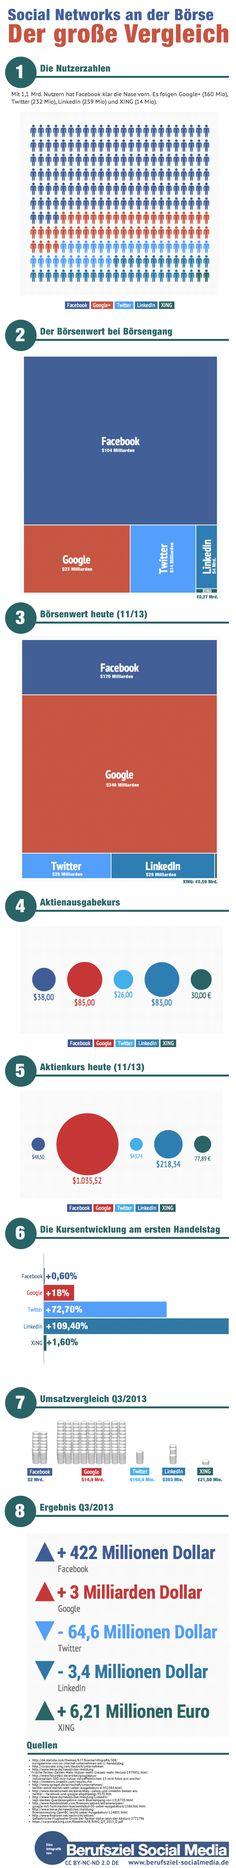 Soziale Netzwerke an der Börse! Der große Vergleich: #Infografik via berufsziel-socialmedia